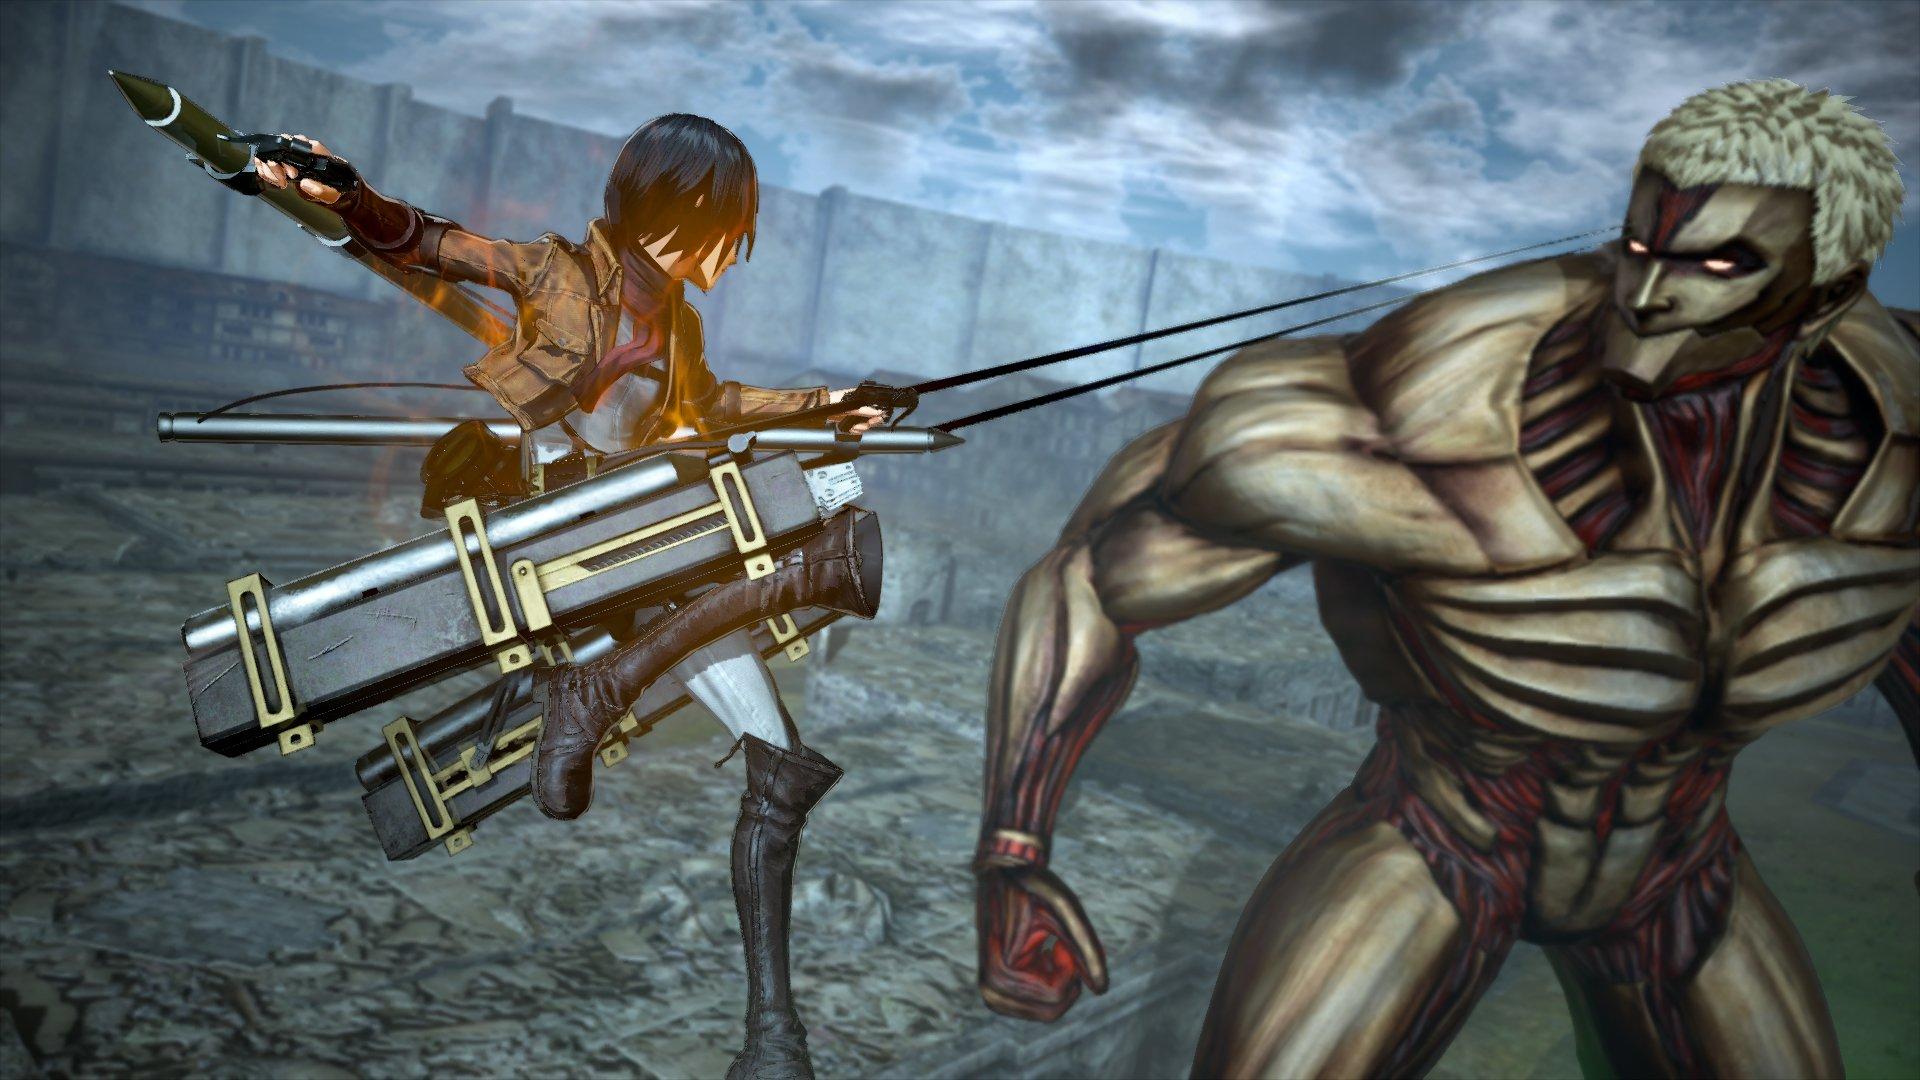 Attack On Titan 2 Final Battle Hands On Impressions Shacknews